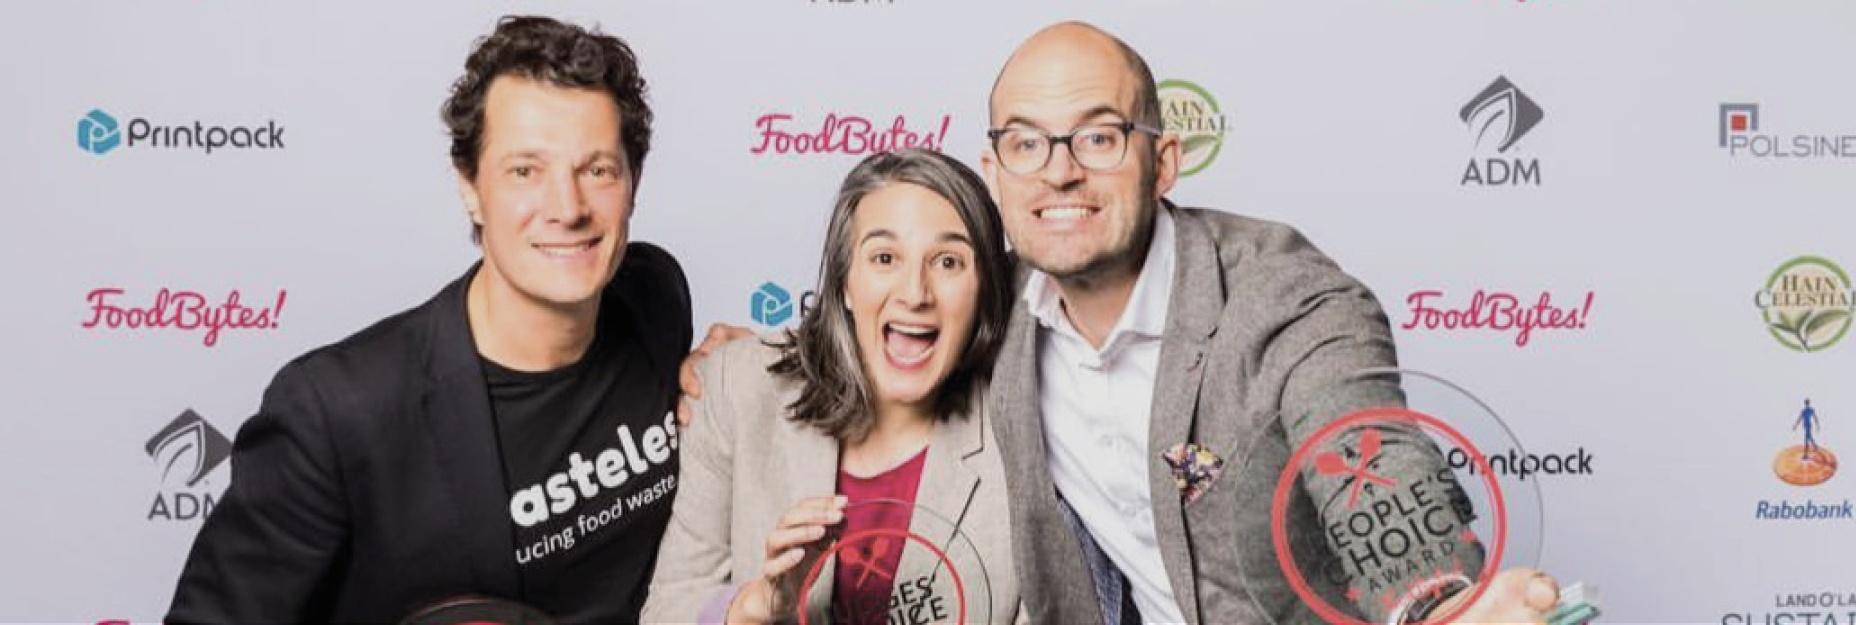 Winnow Wins People's Choice Award at Foodbytes NYC